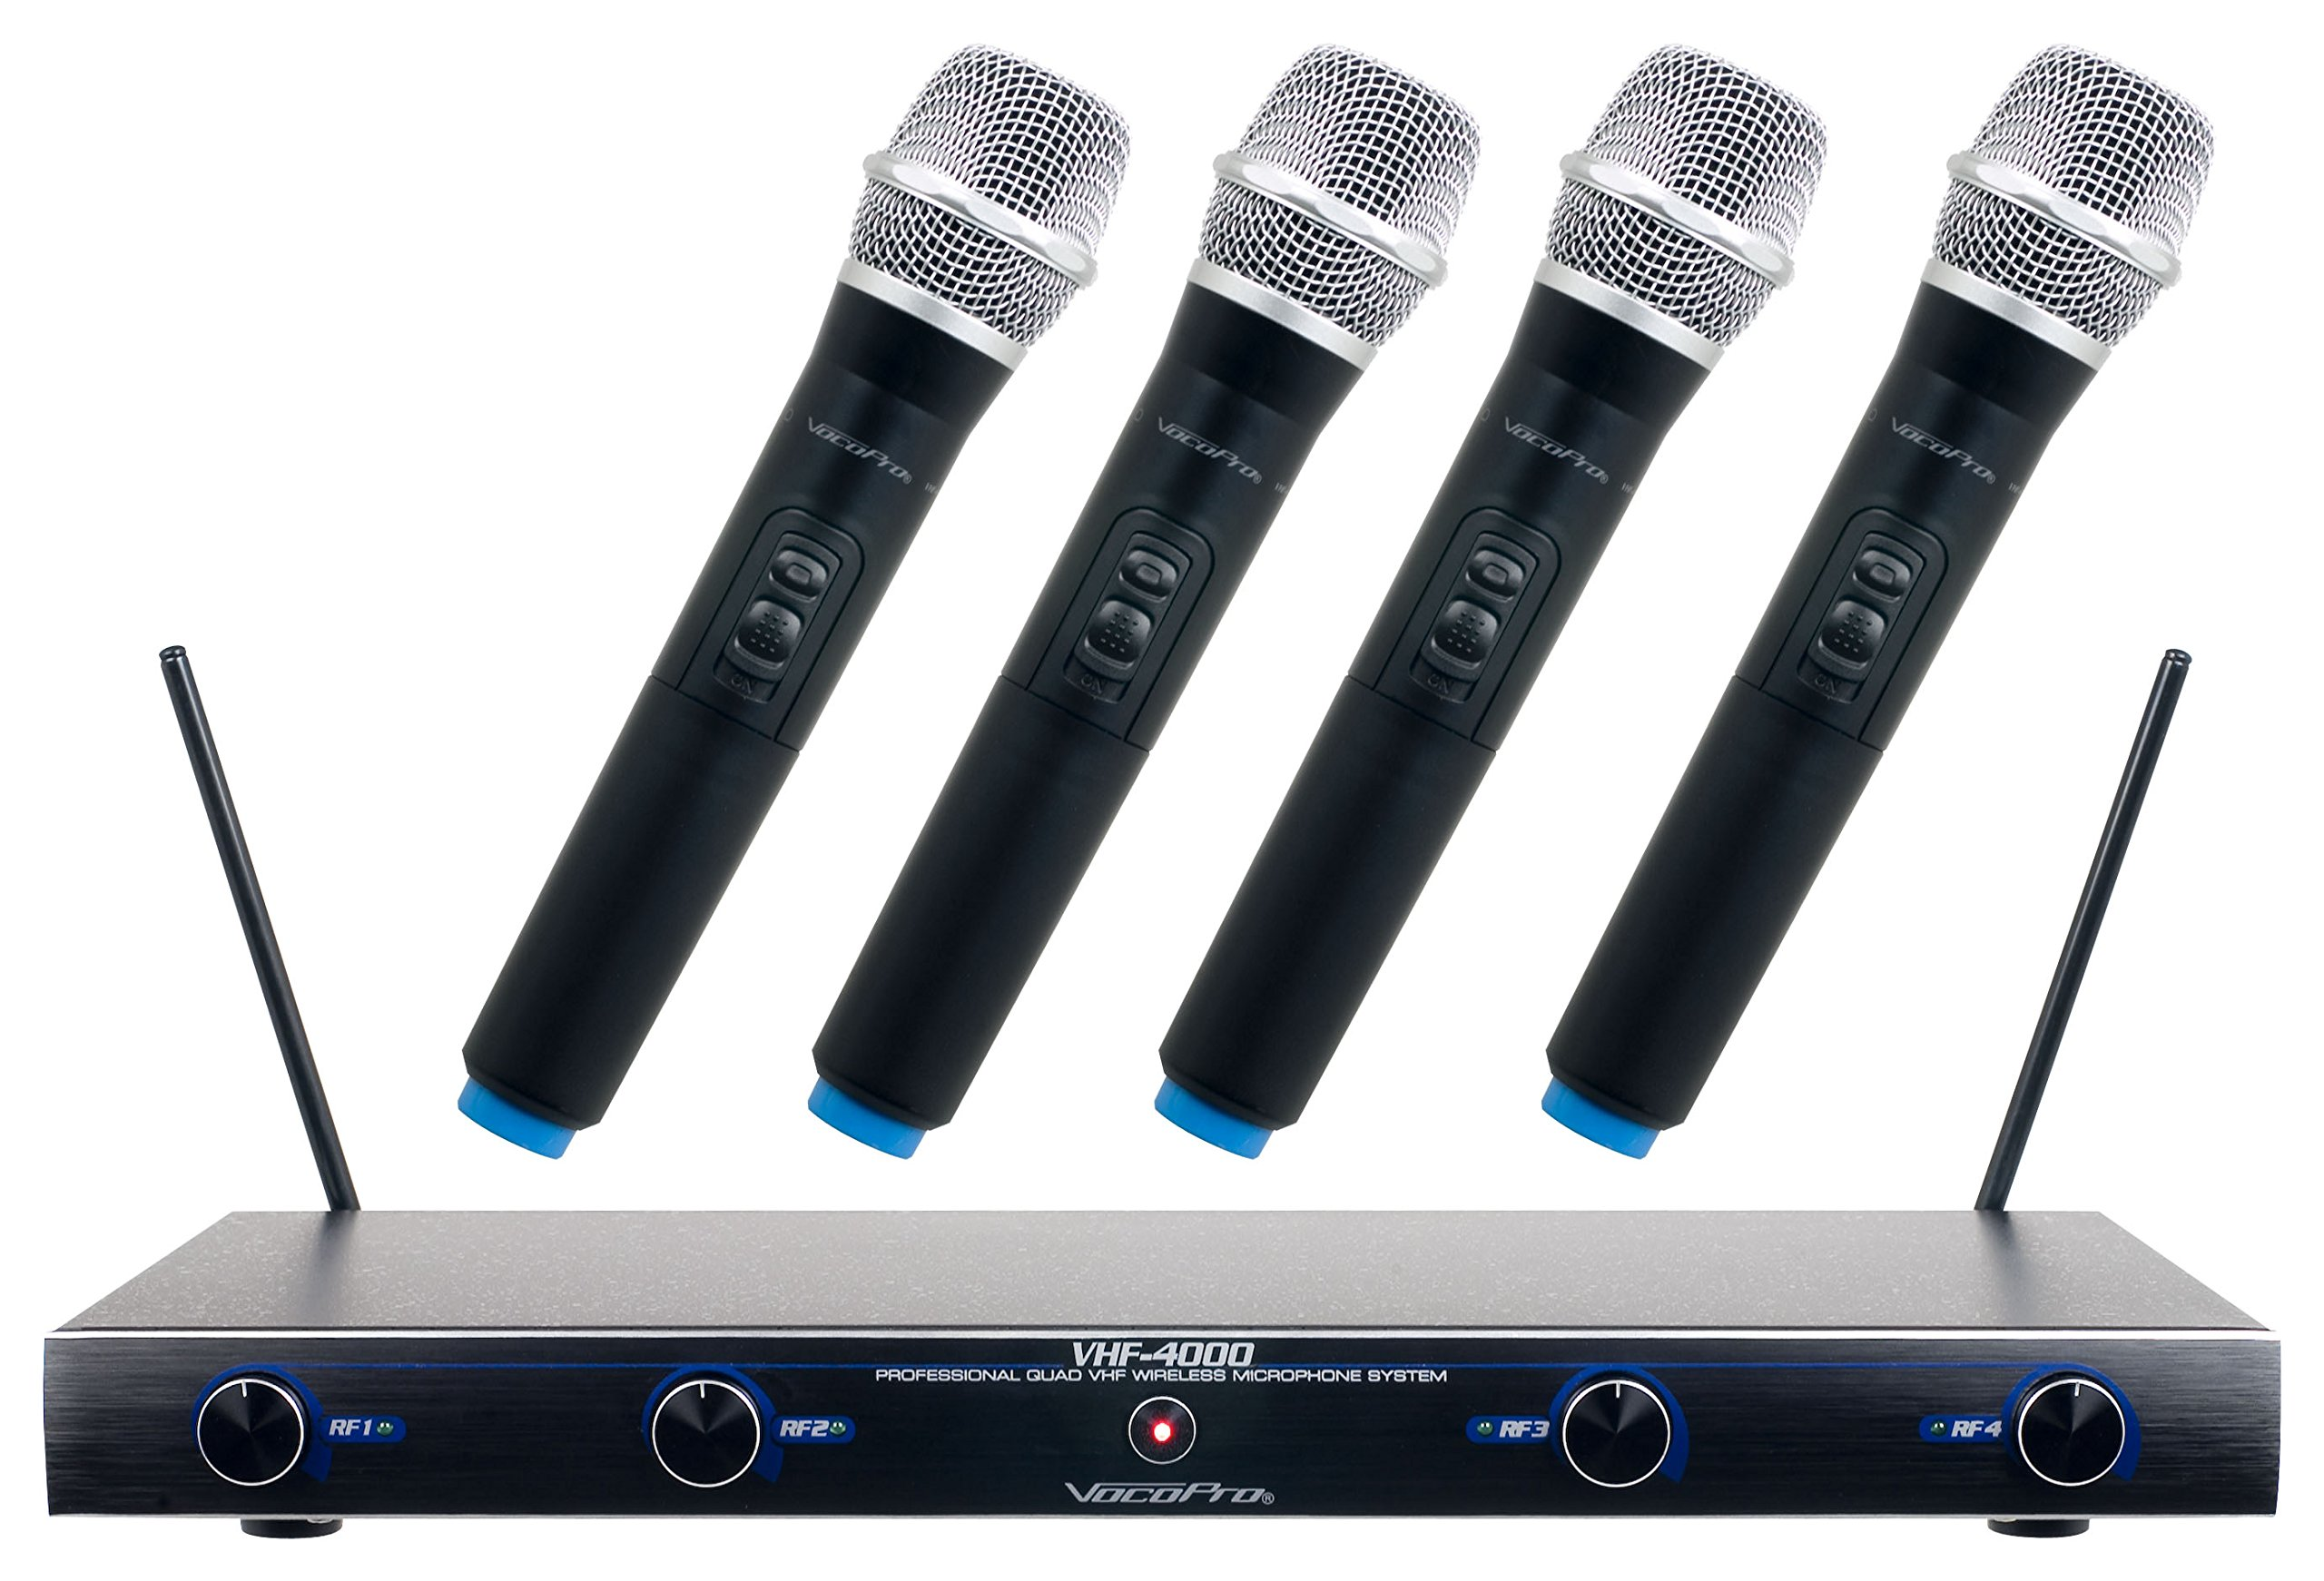 VocoPro VHF4000 Professional Quad VHF Wireless Microphone System